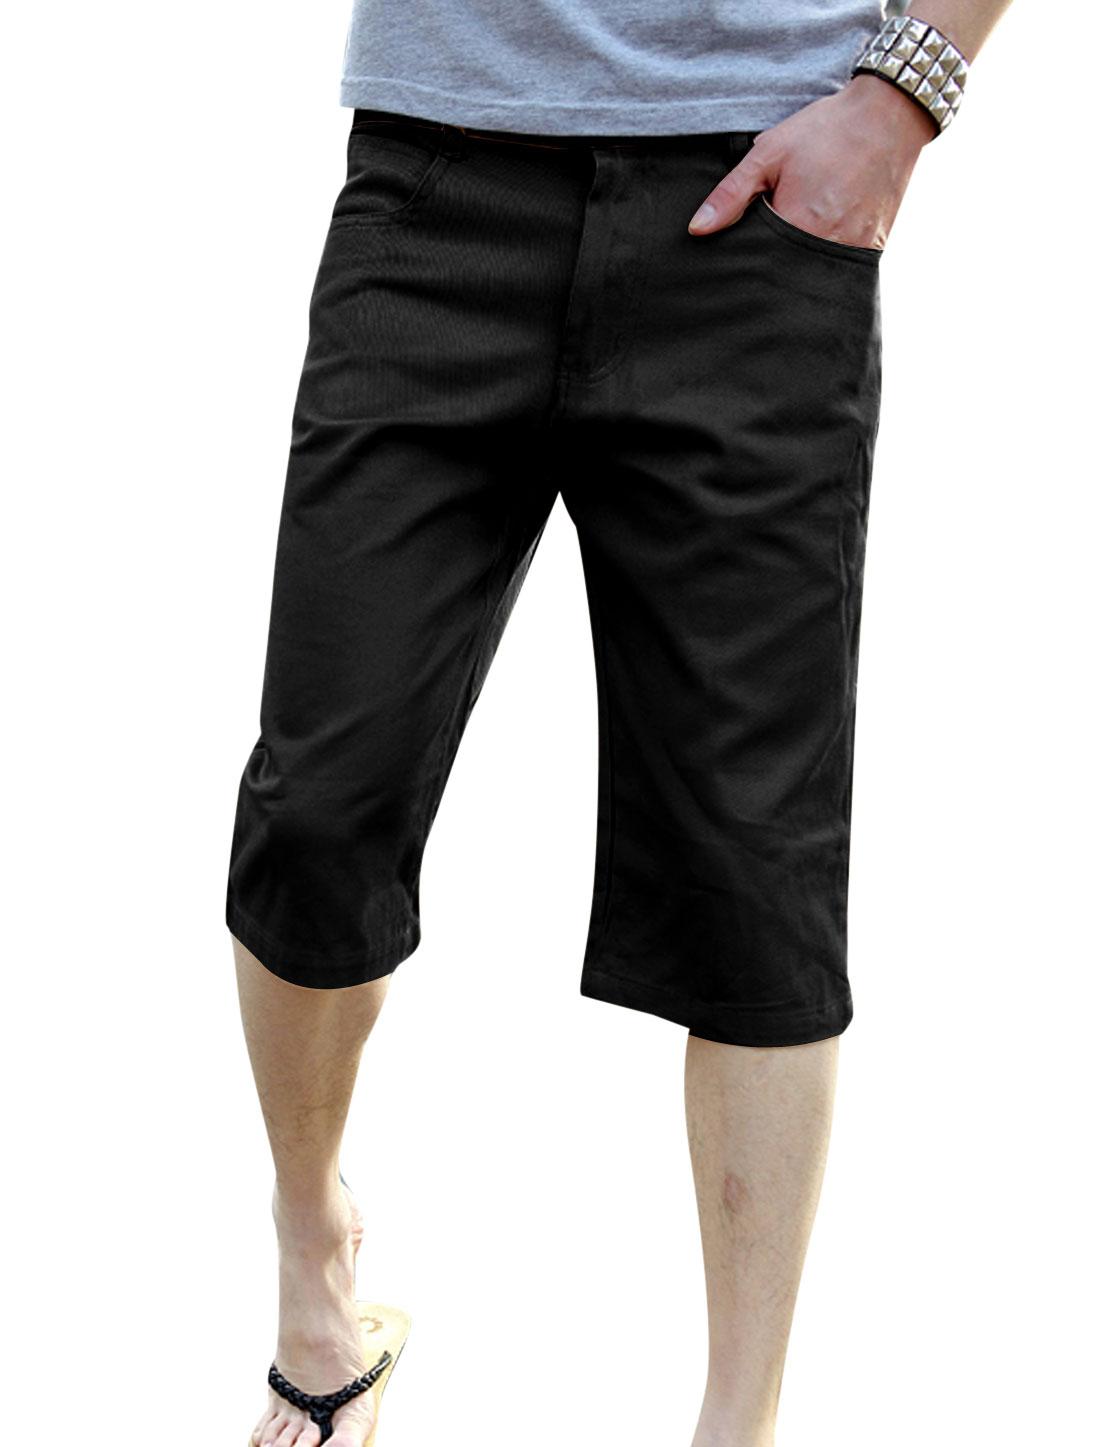 Men Zip Fly Panel Design One Button Up Mid Rise Capri Pants Black W30